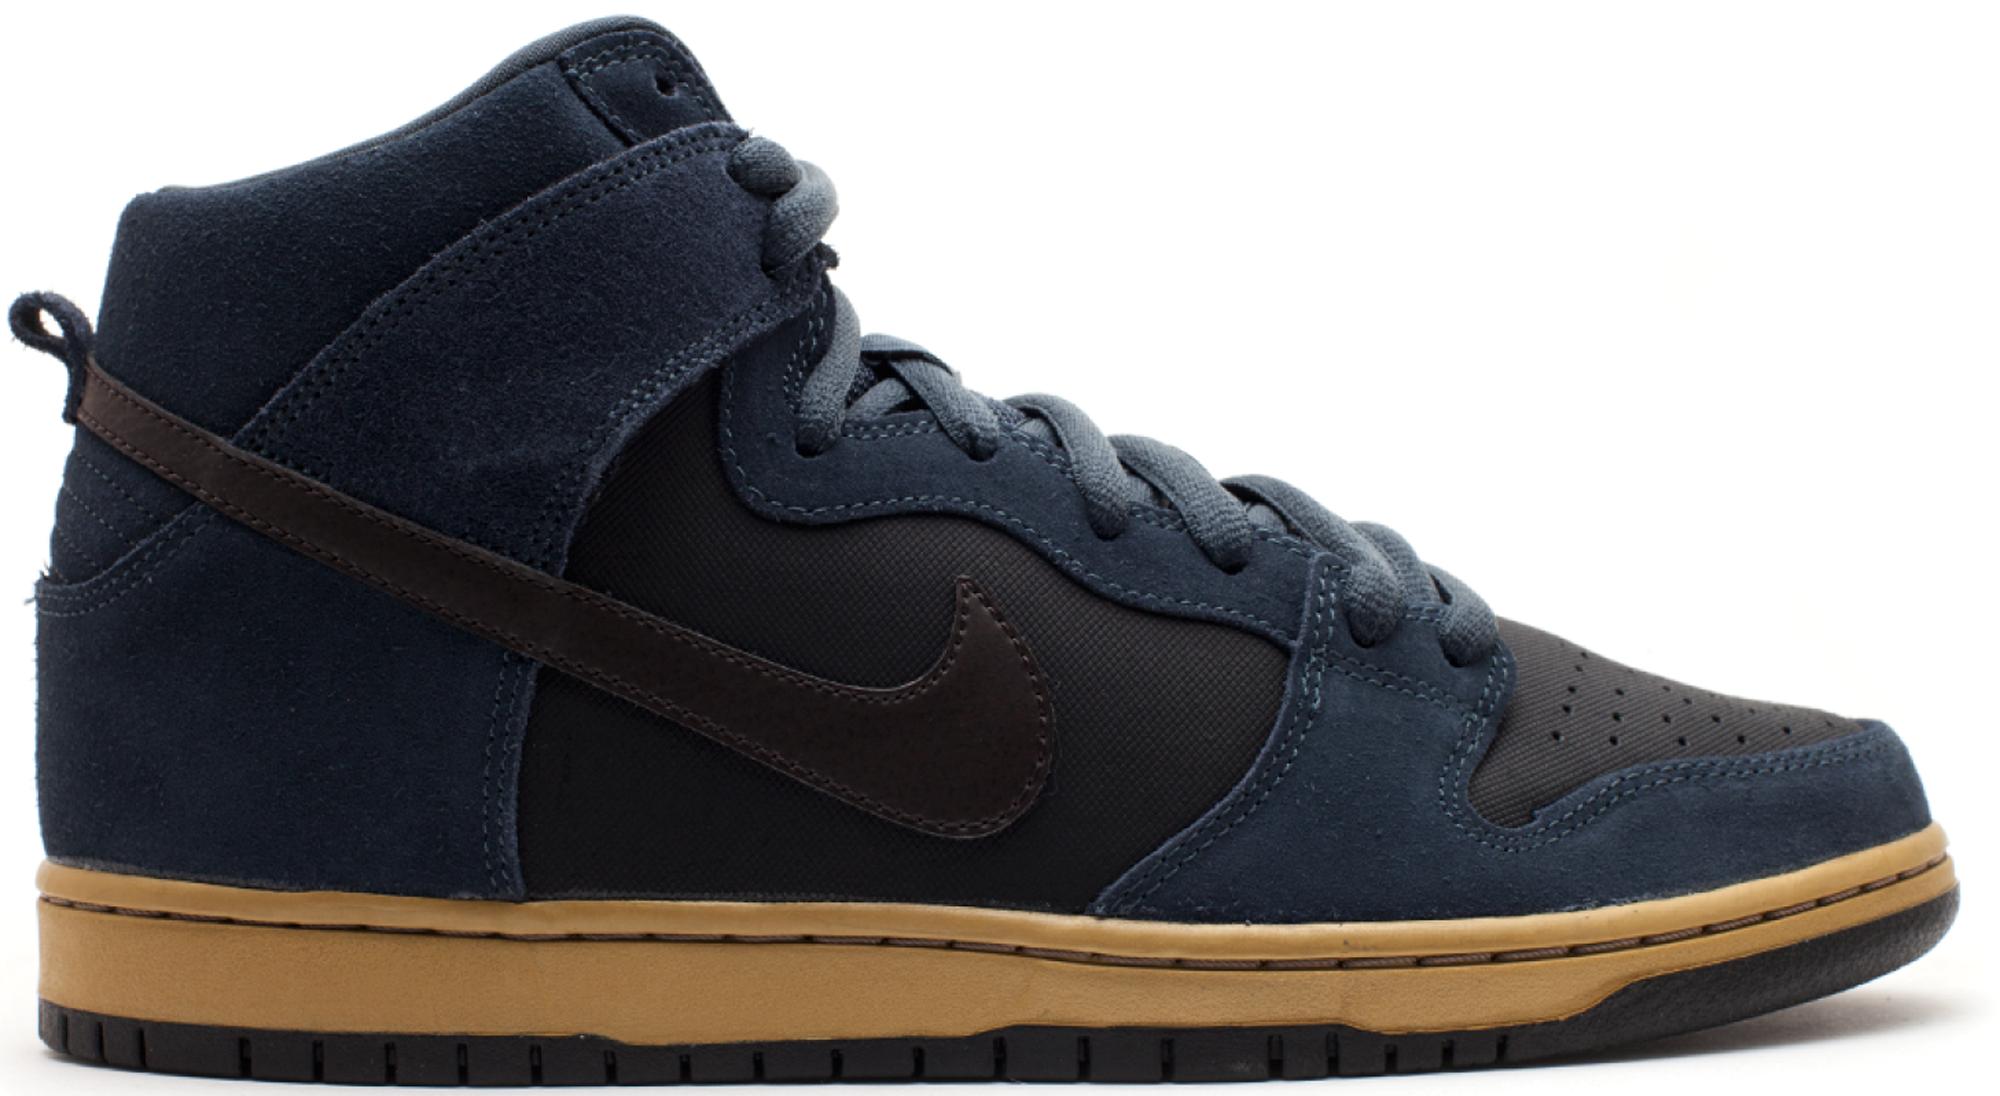 Nike SB Dunk High Classic Charcoal Tar